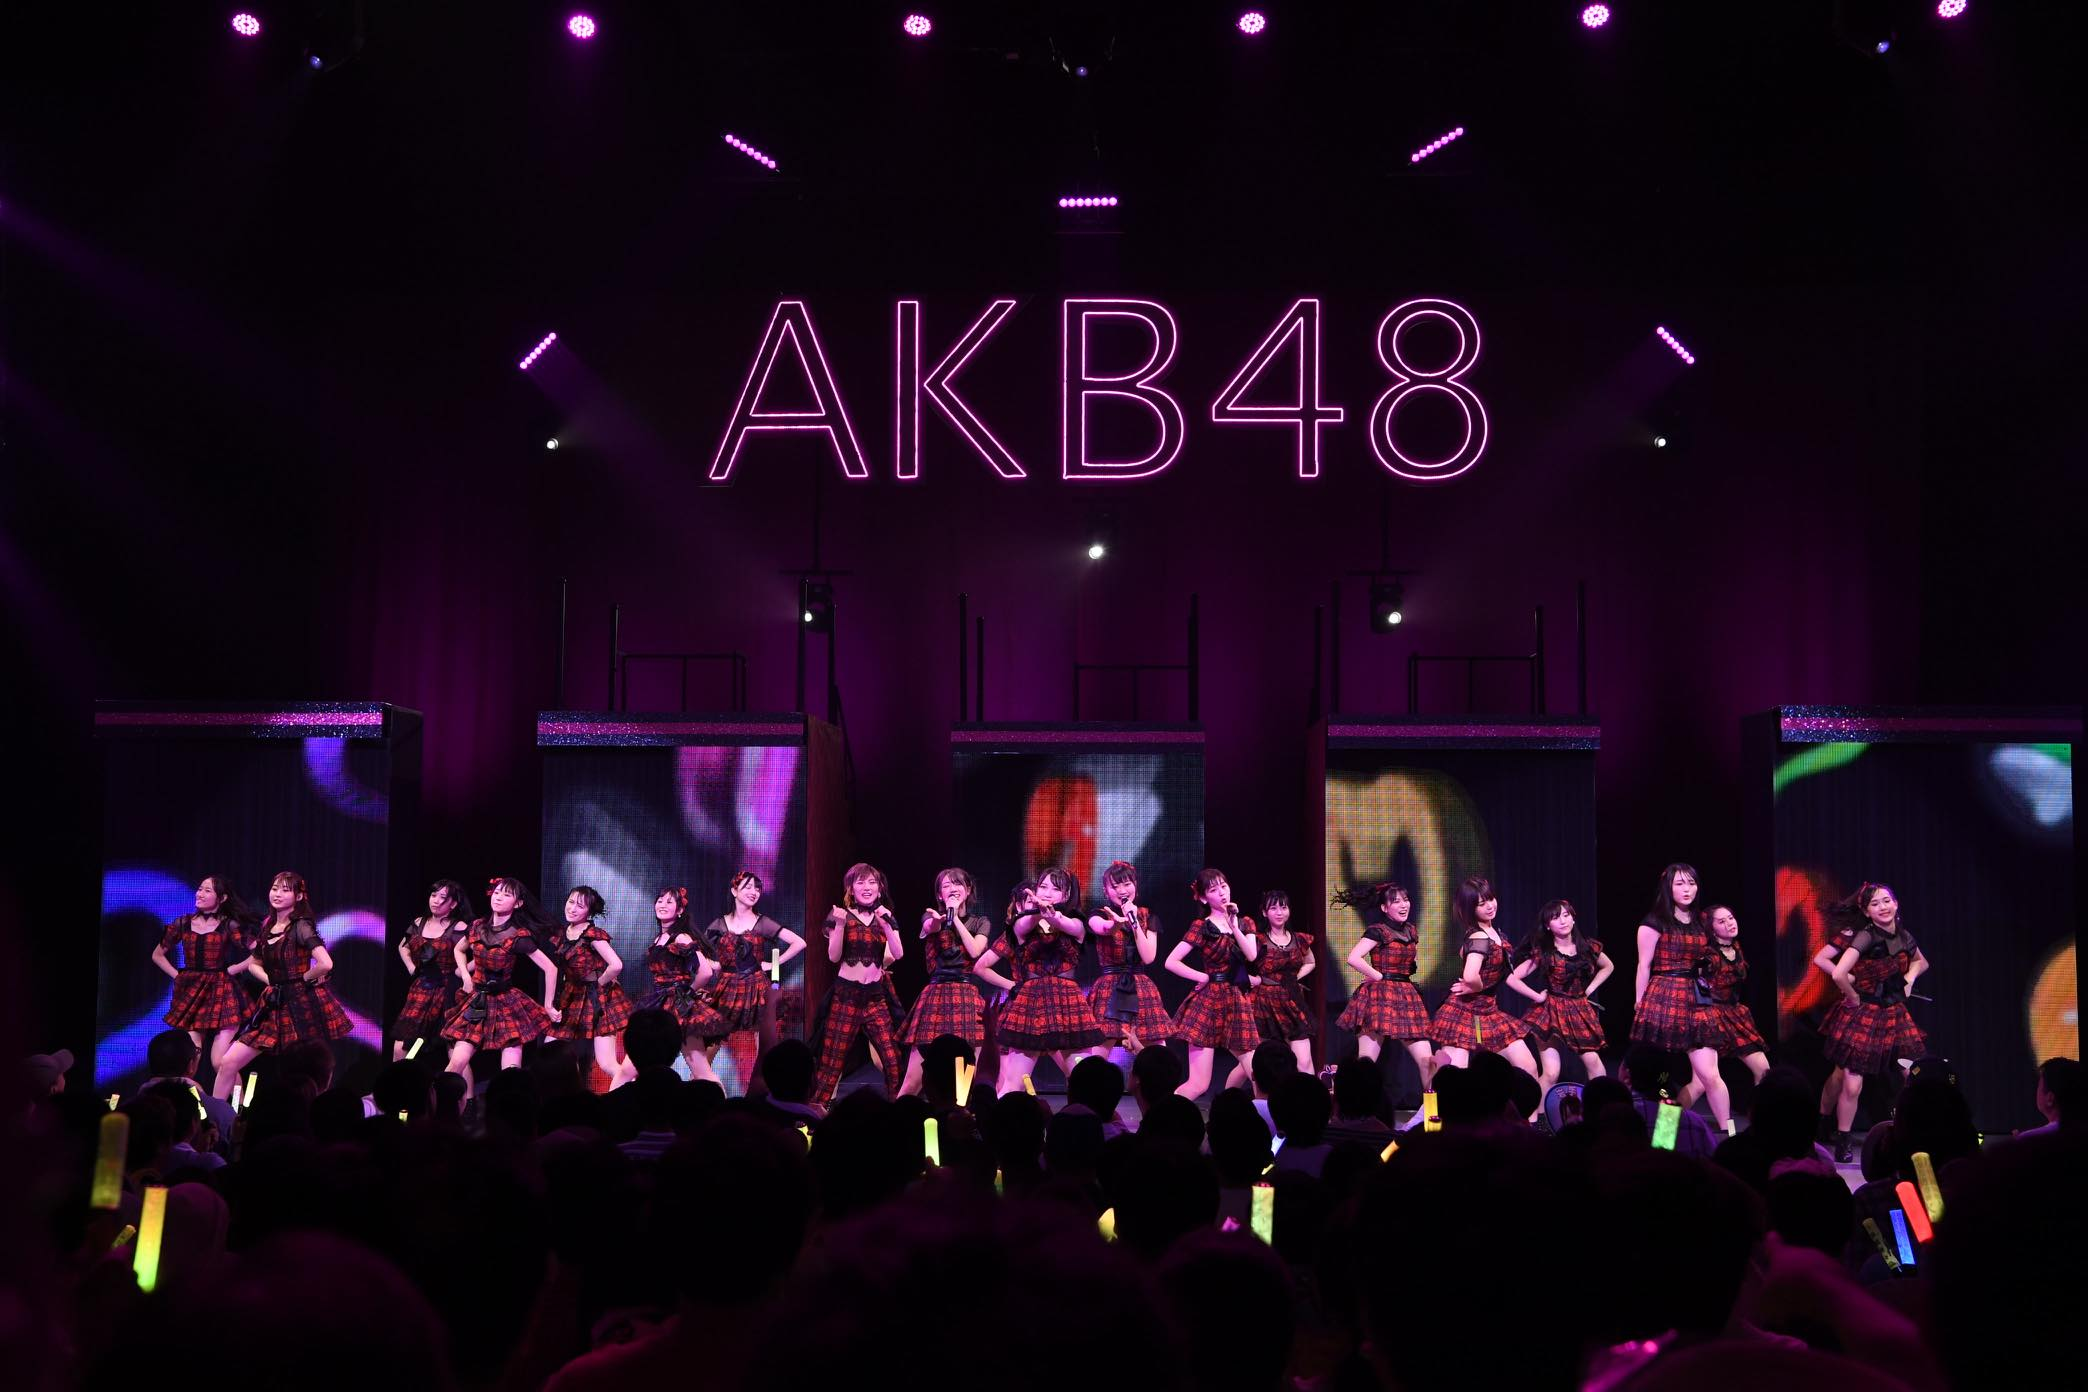 AKB48全国ツアー「神奈川公演」開催、チームBとチーム4のパワーが炸裂!【写真17枚】の画像016